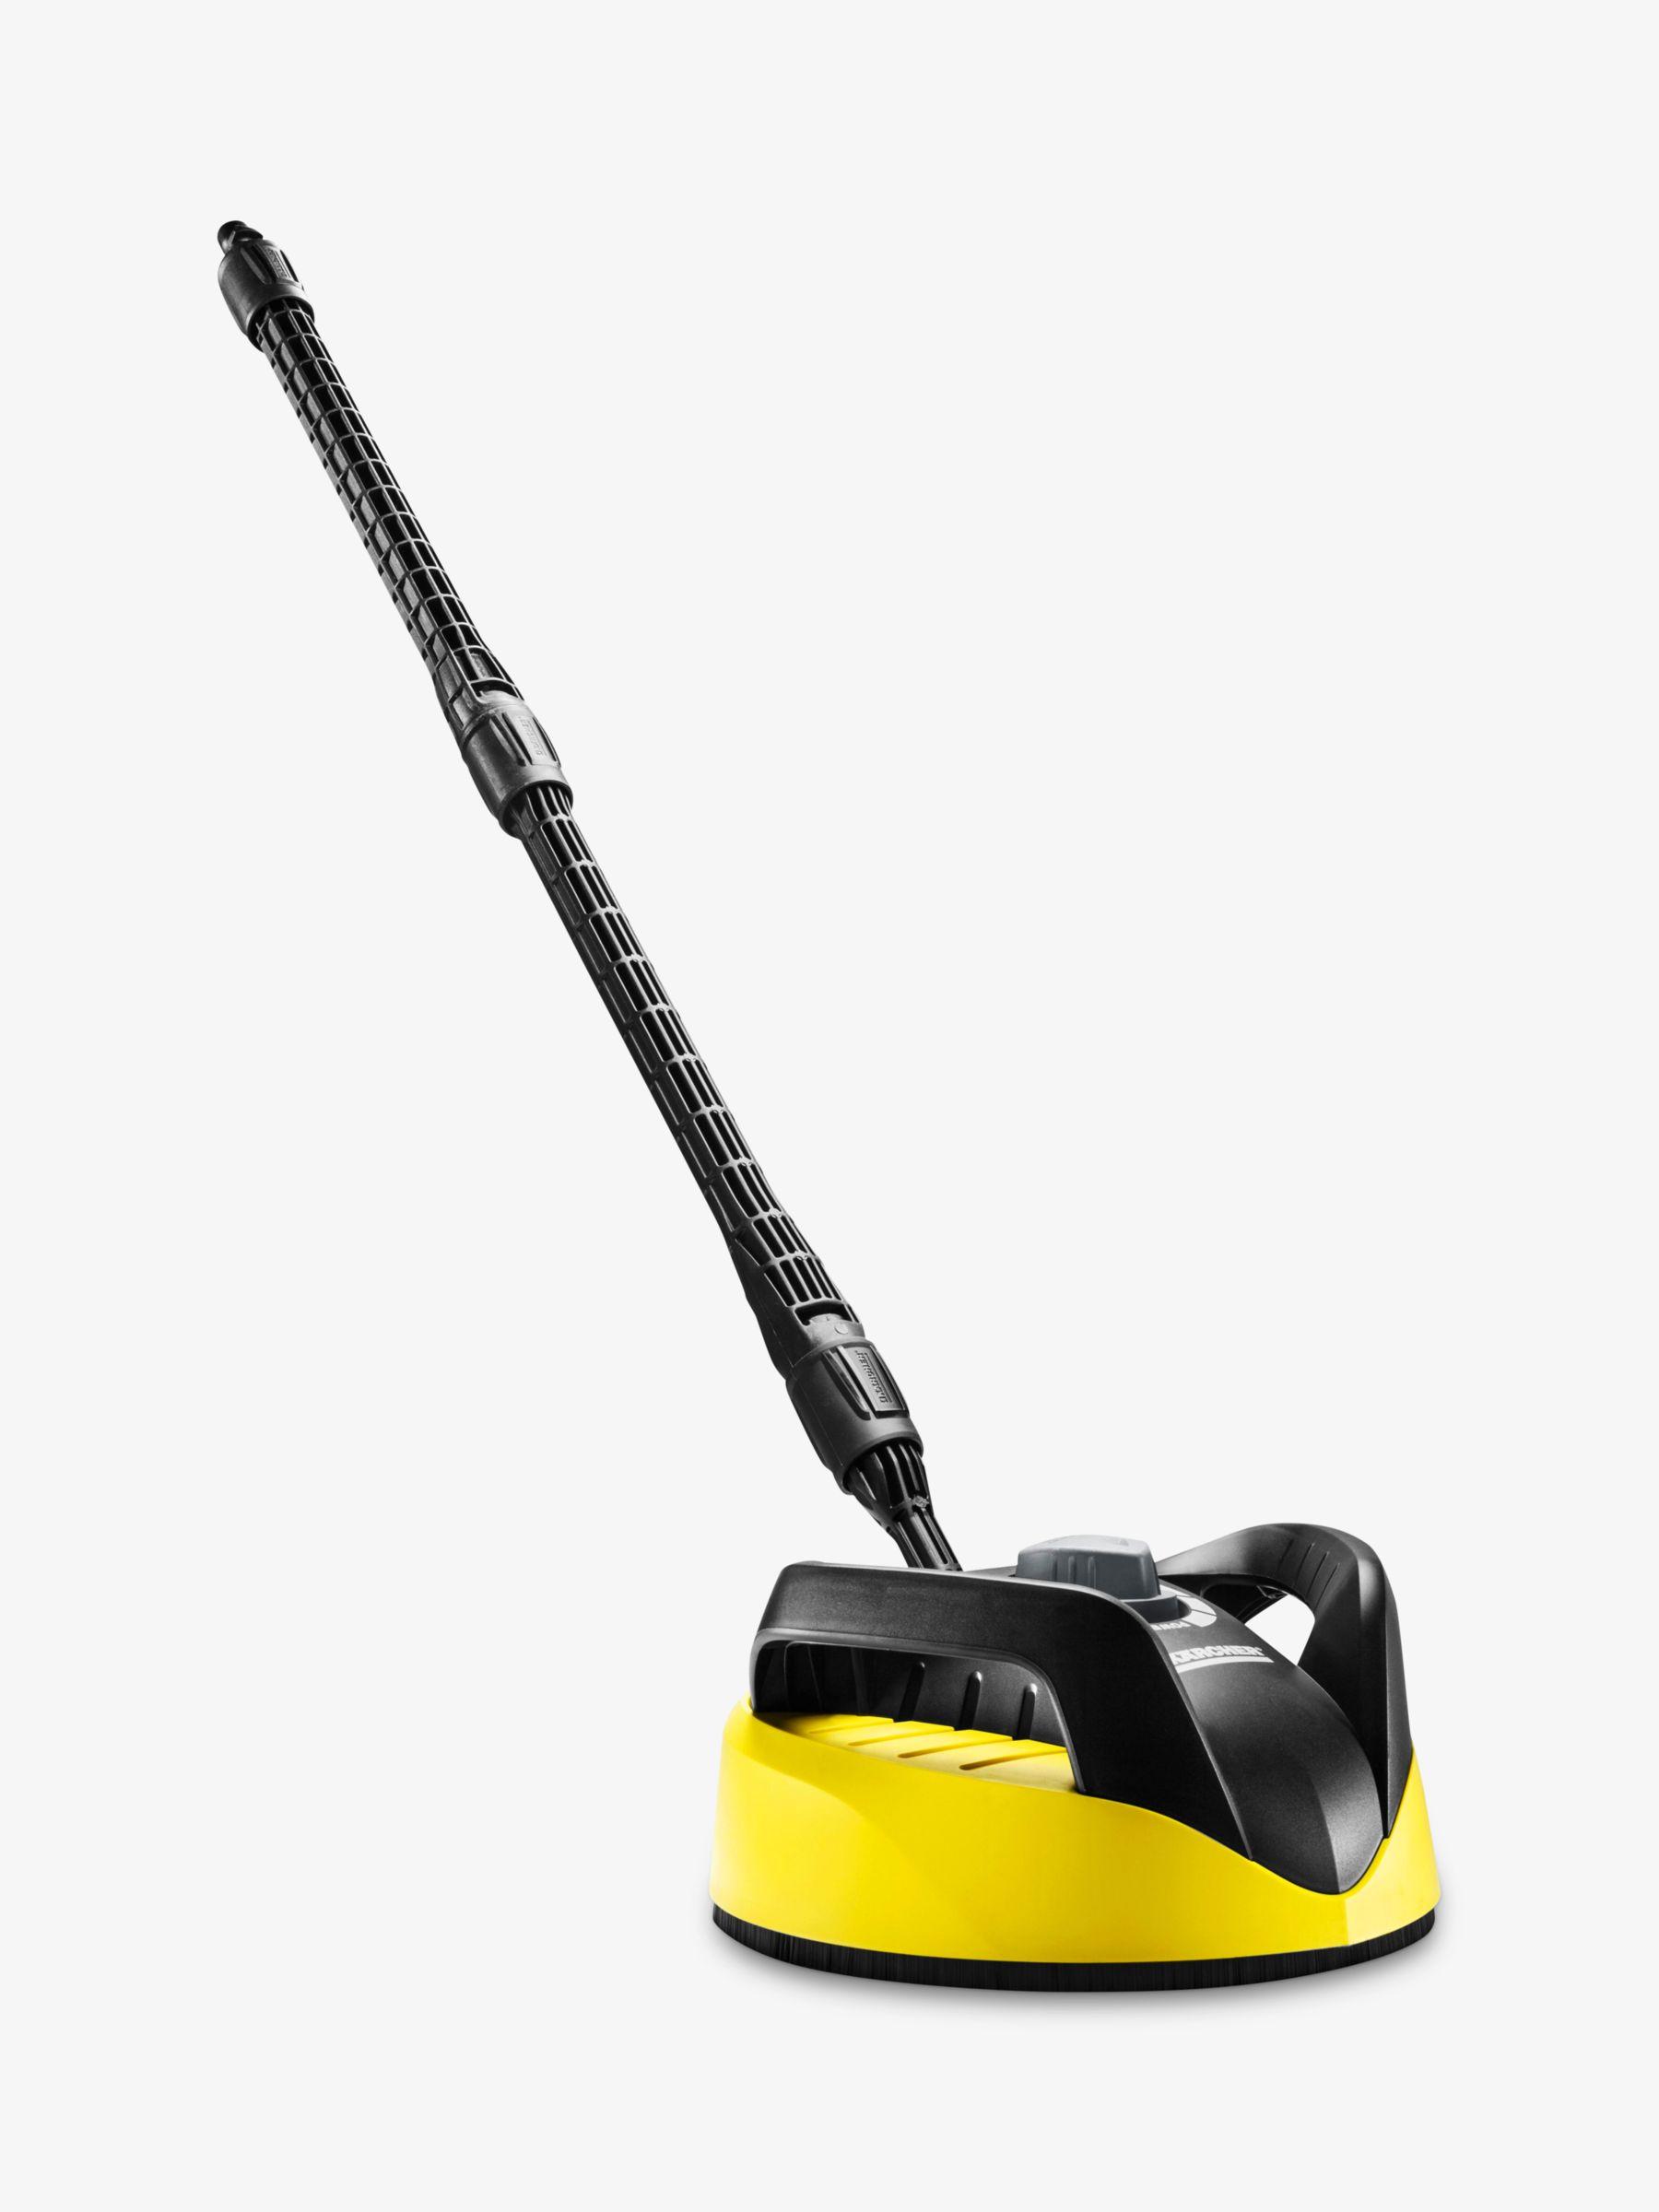 Karcher Kärcher T350 Patio Cleaner